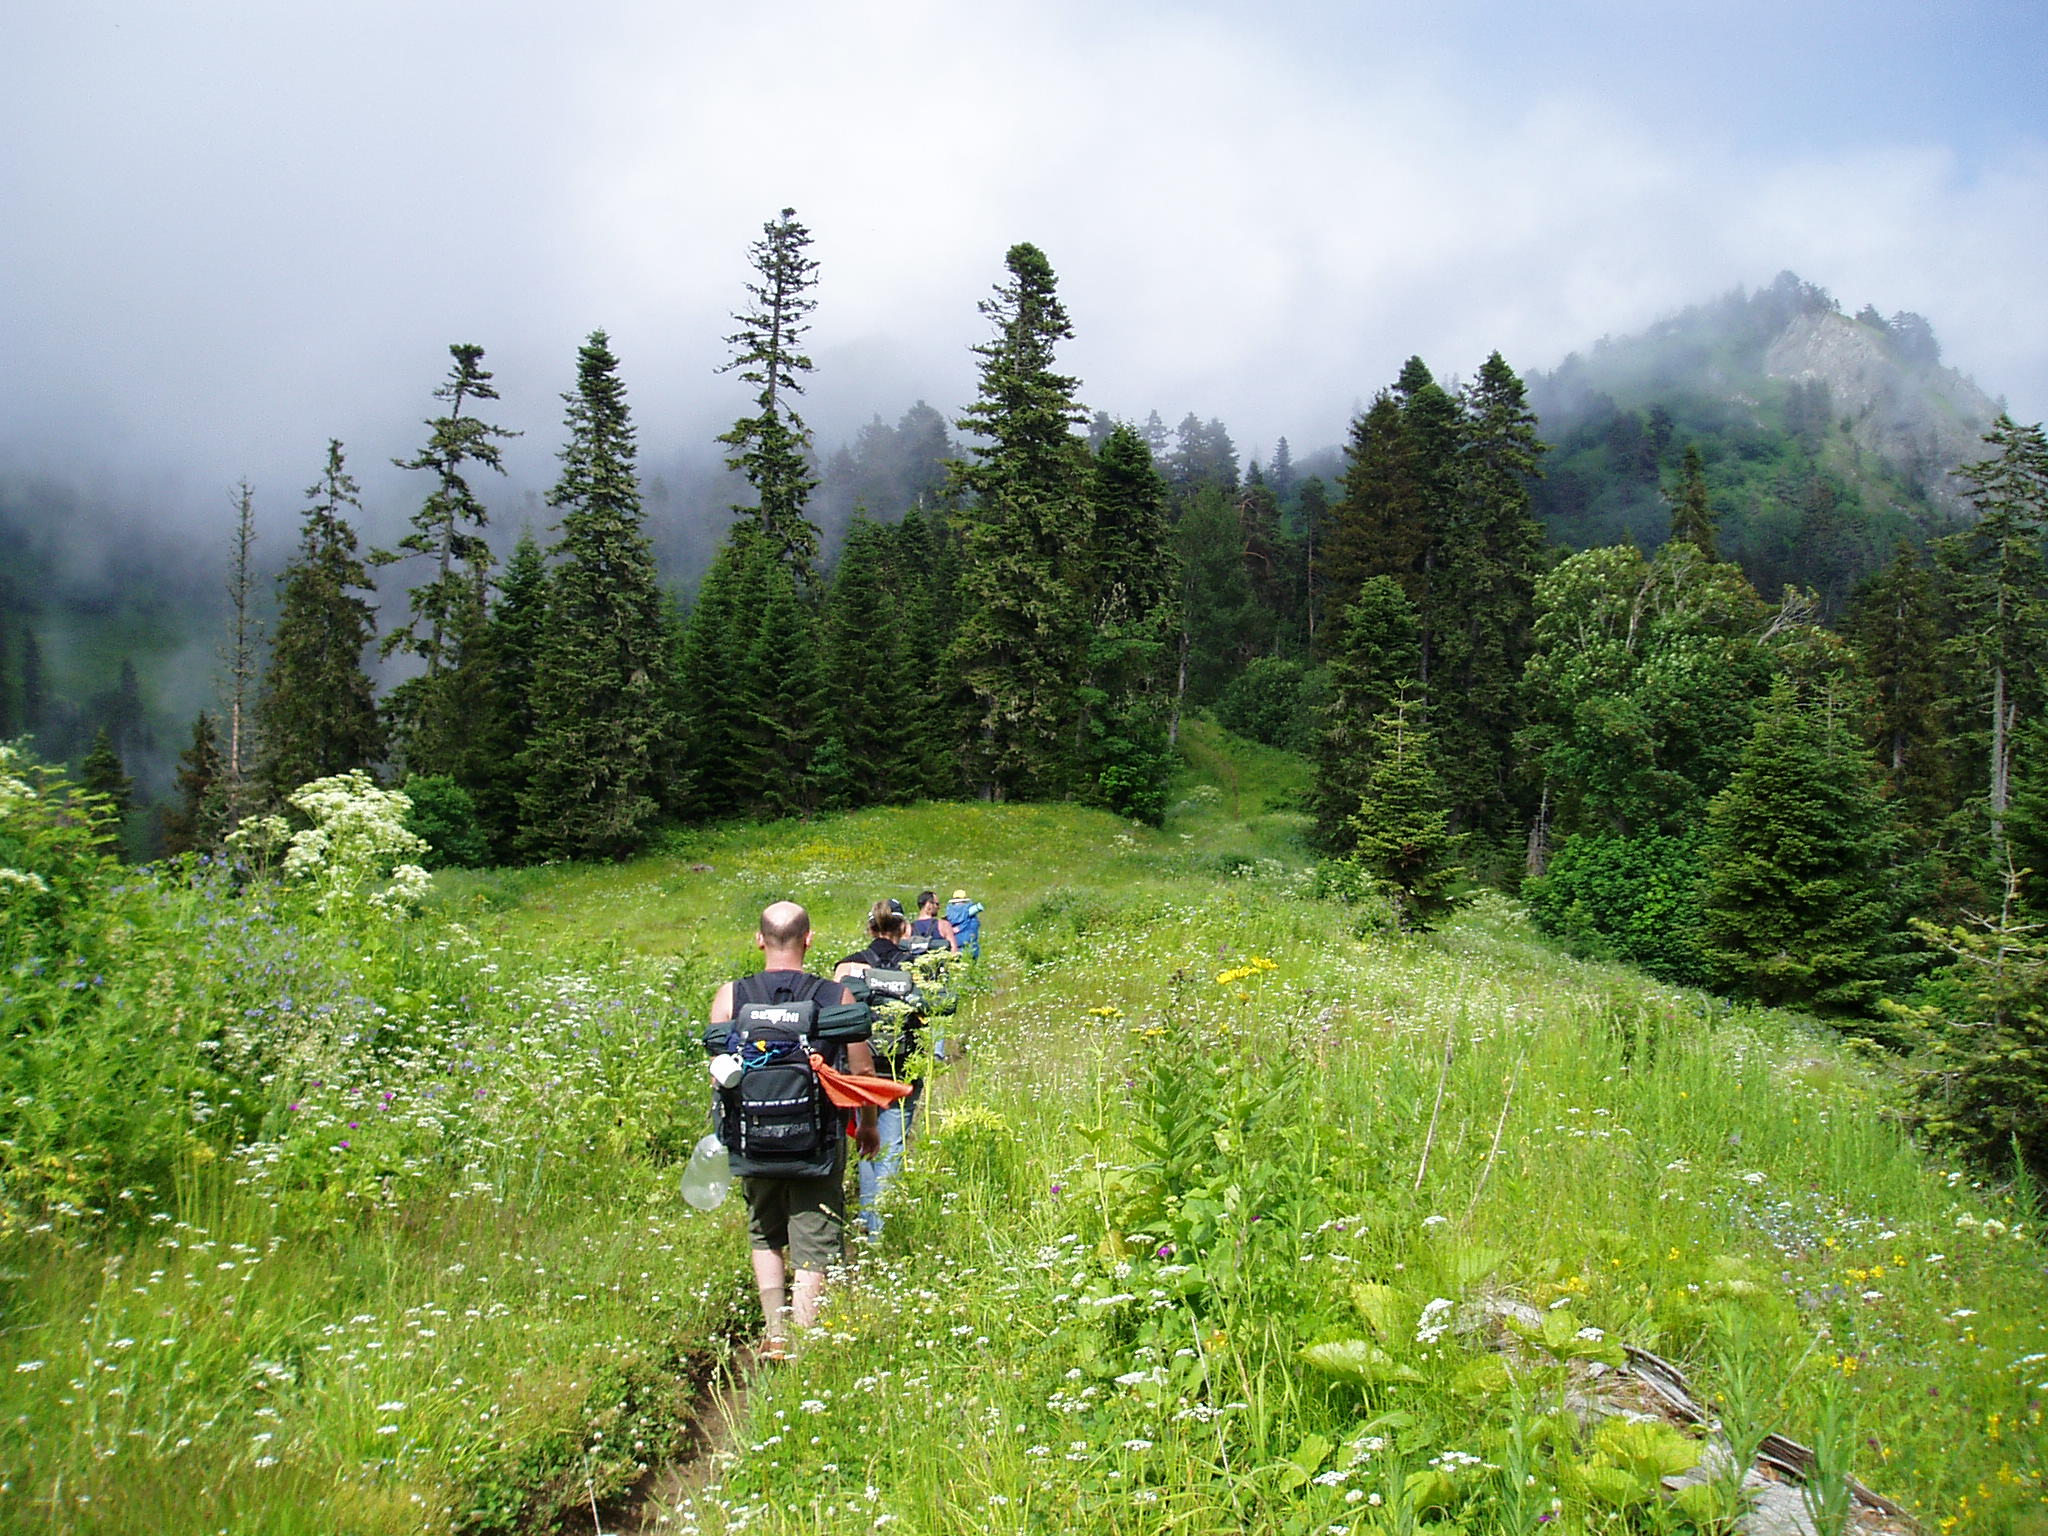 Trail of St. Andrew's at Borjomi-Kharagauli